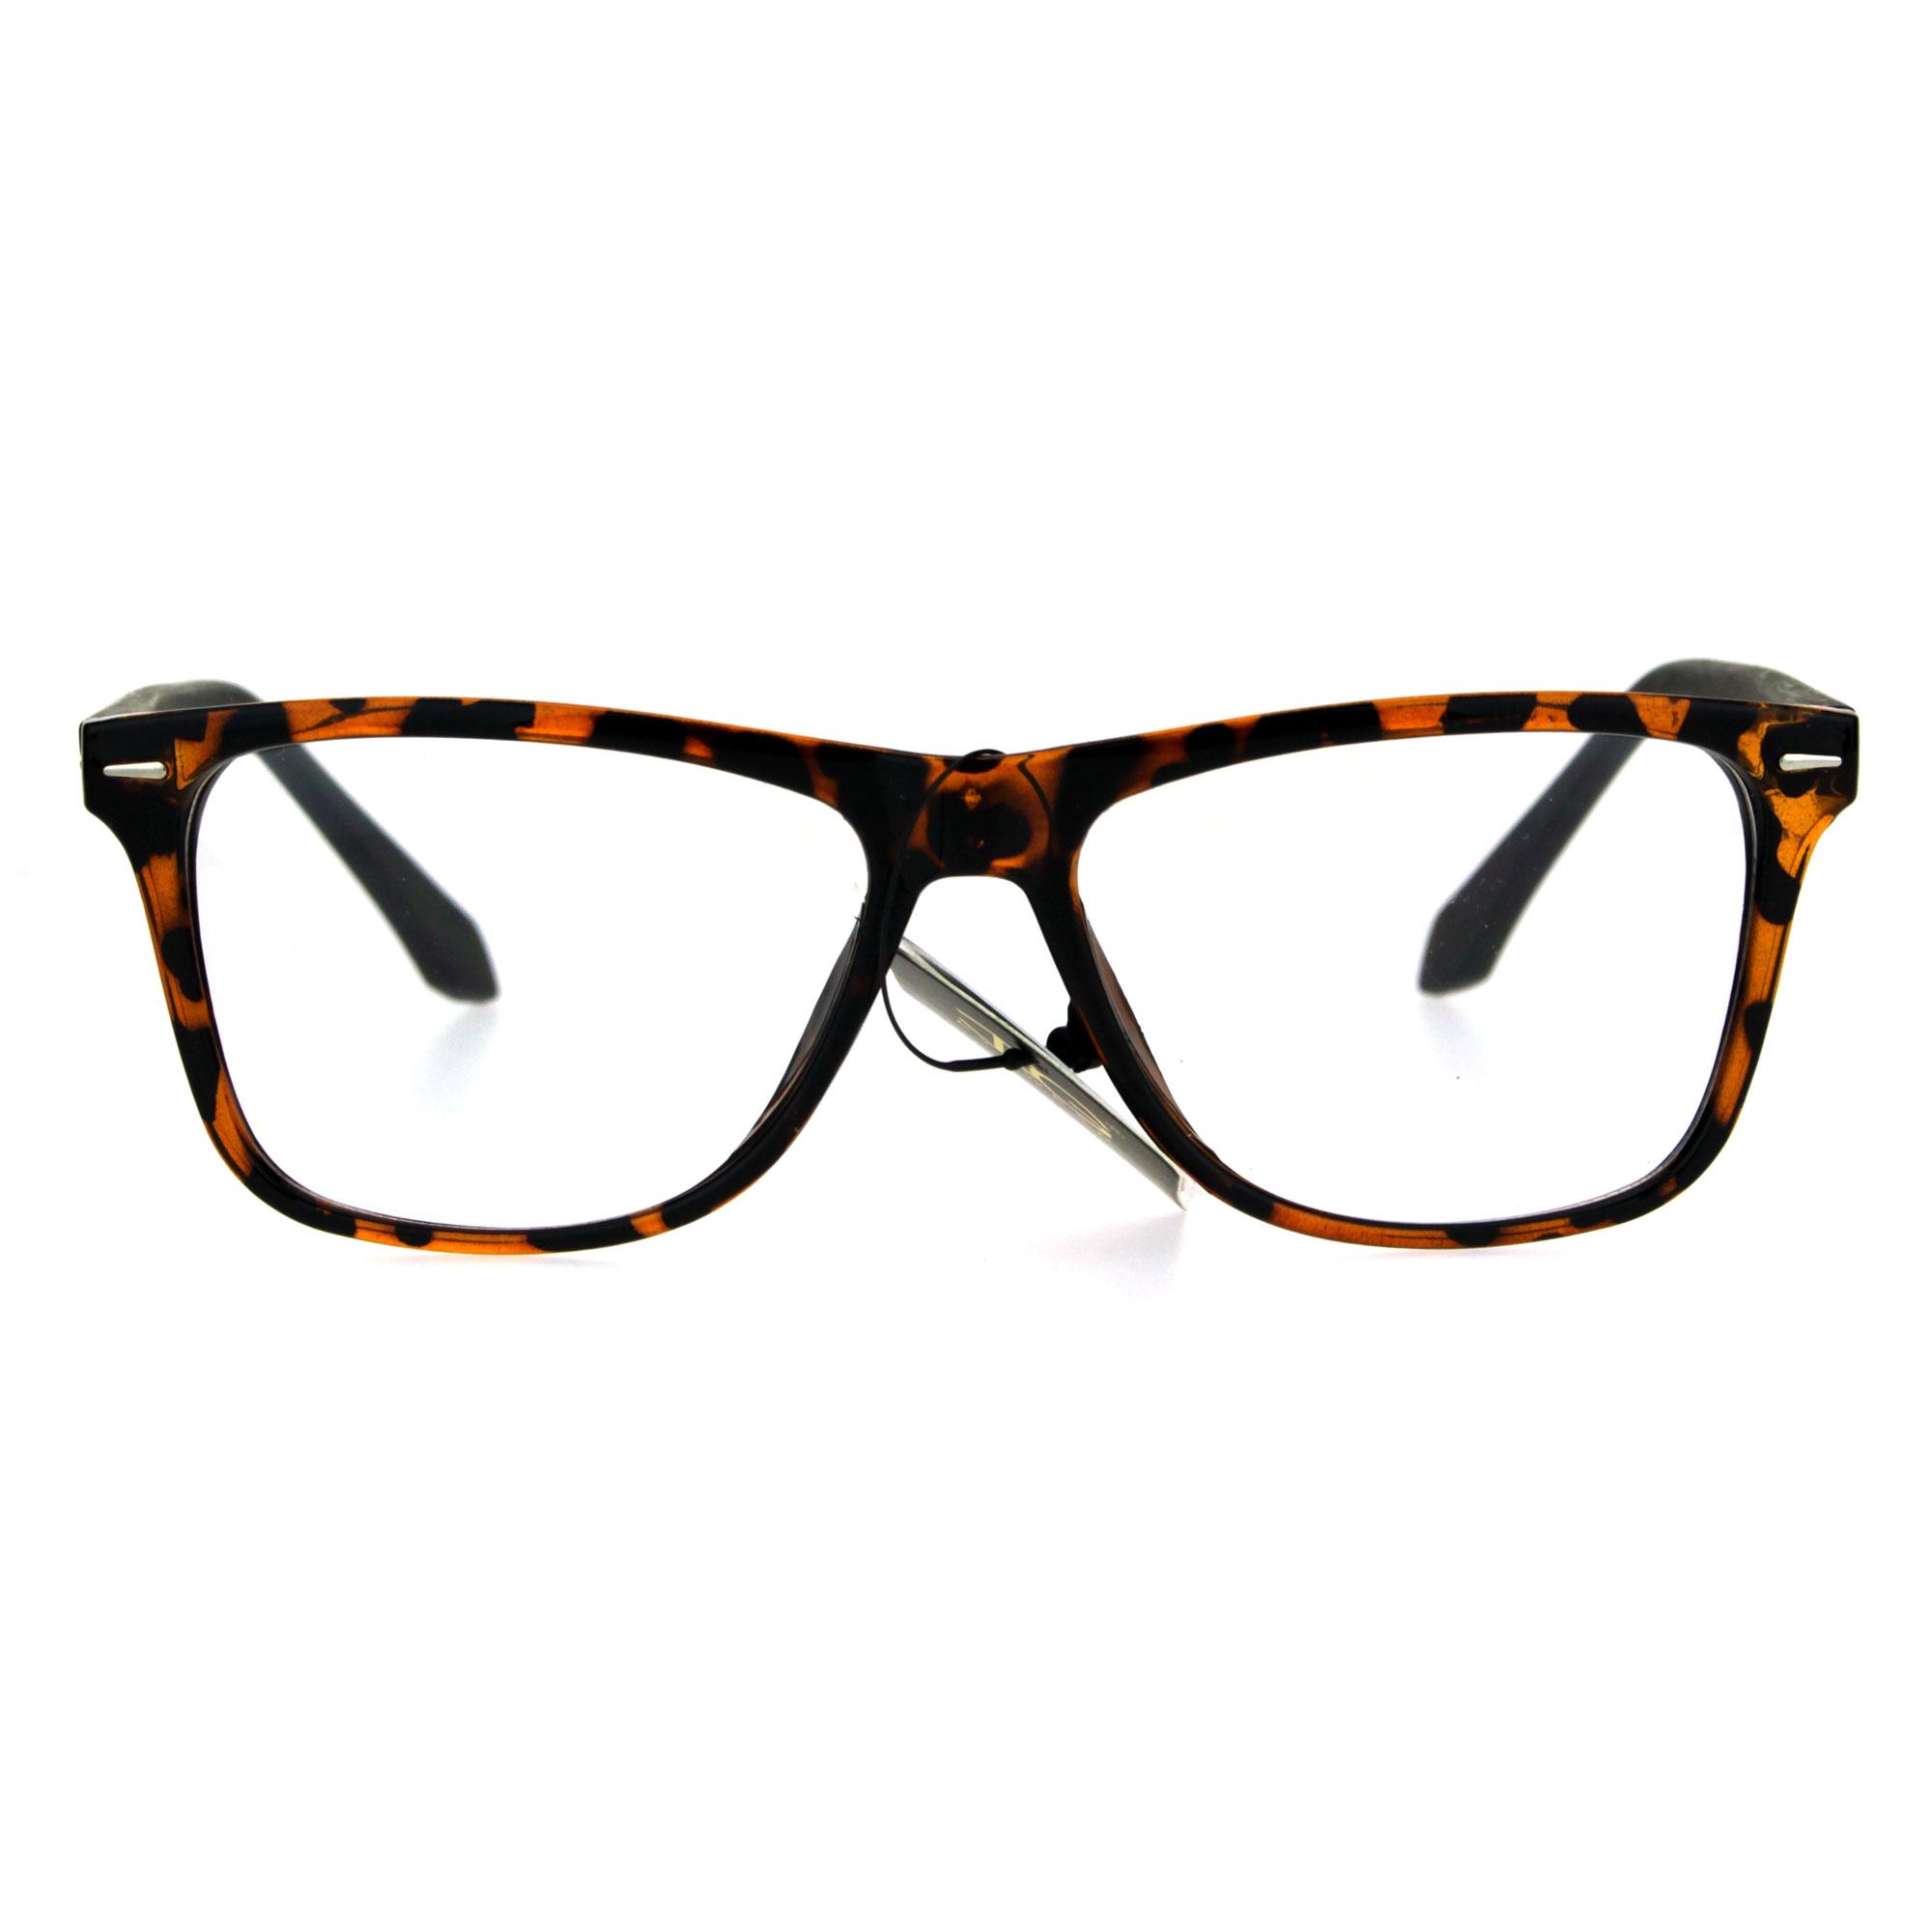 How to Clean Eyeglasses  Prescriptions Glasses  Frames